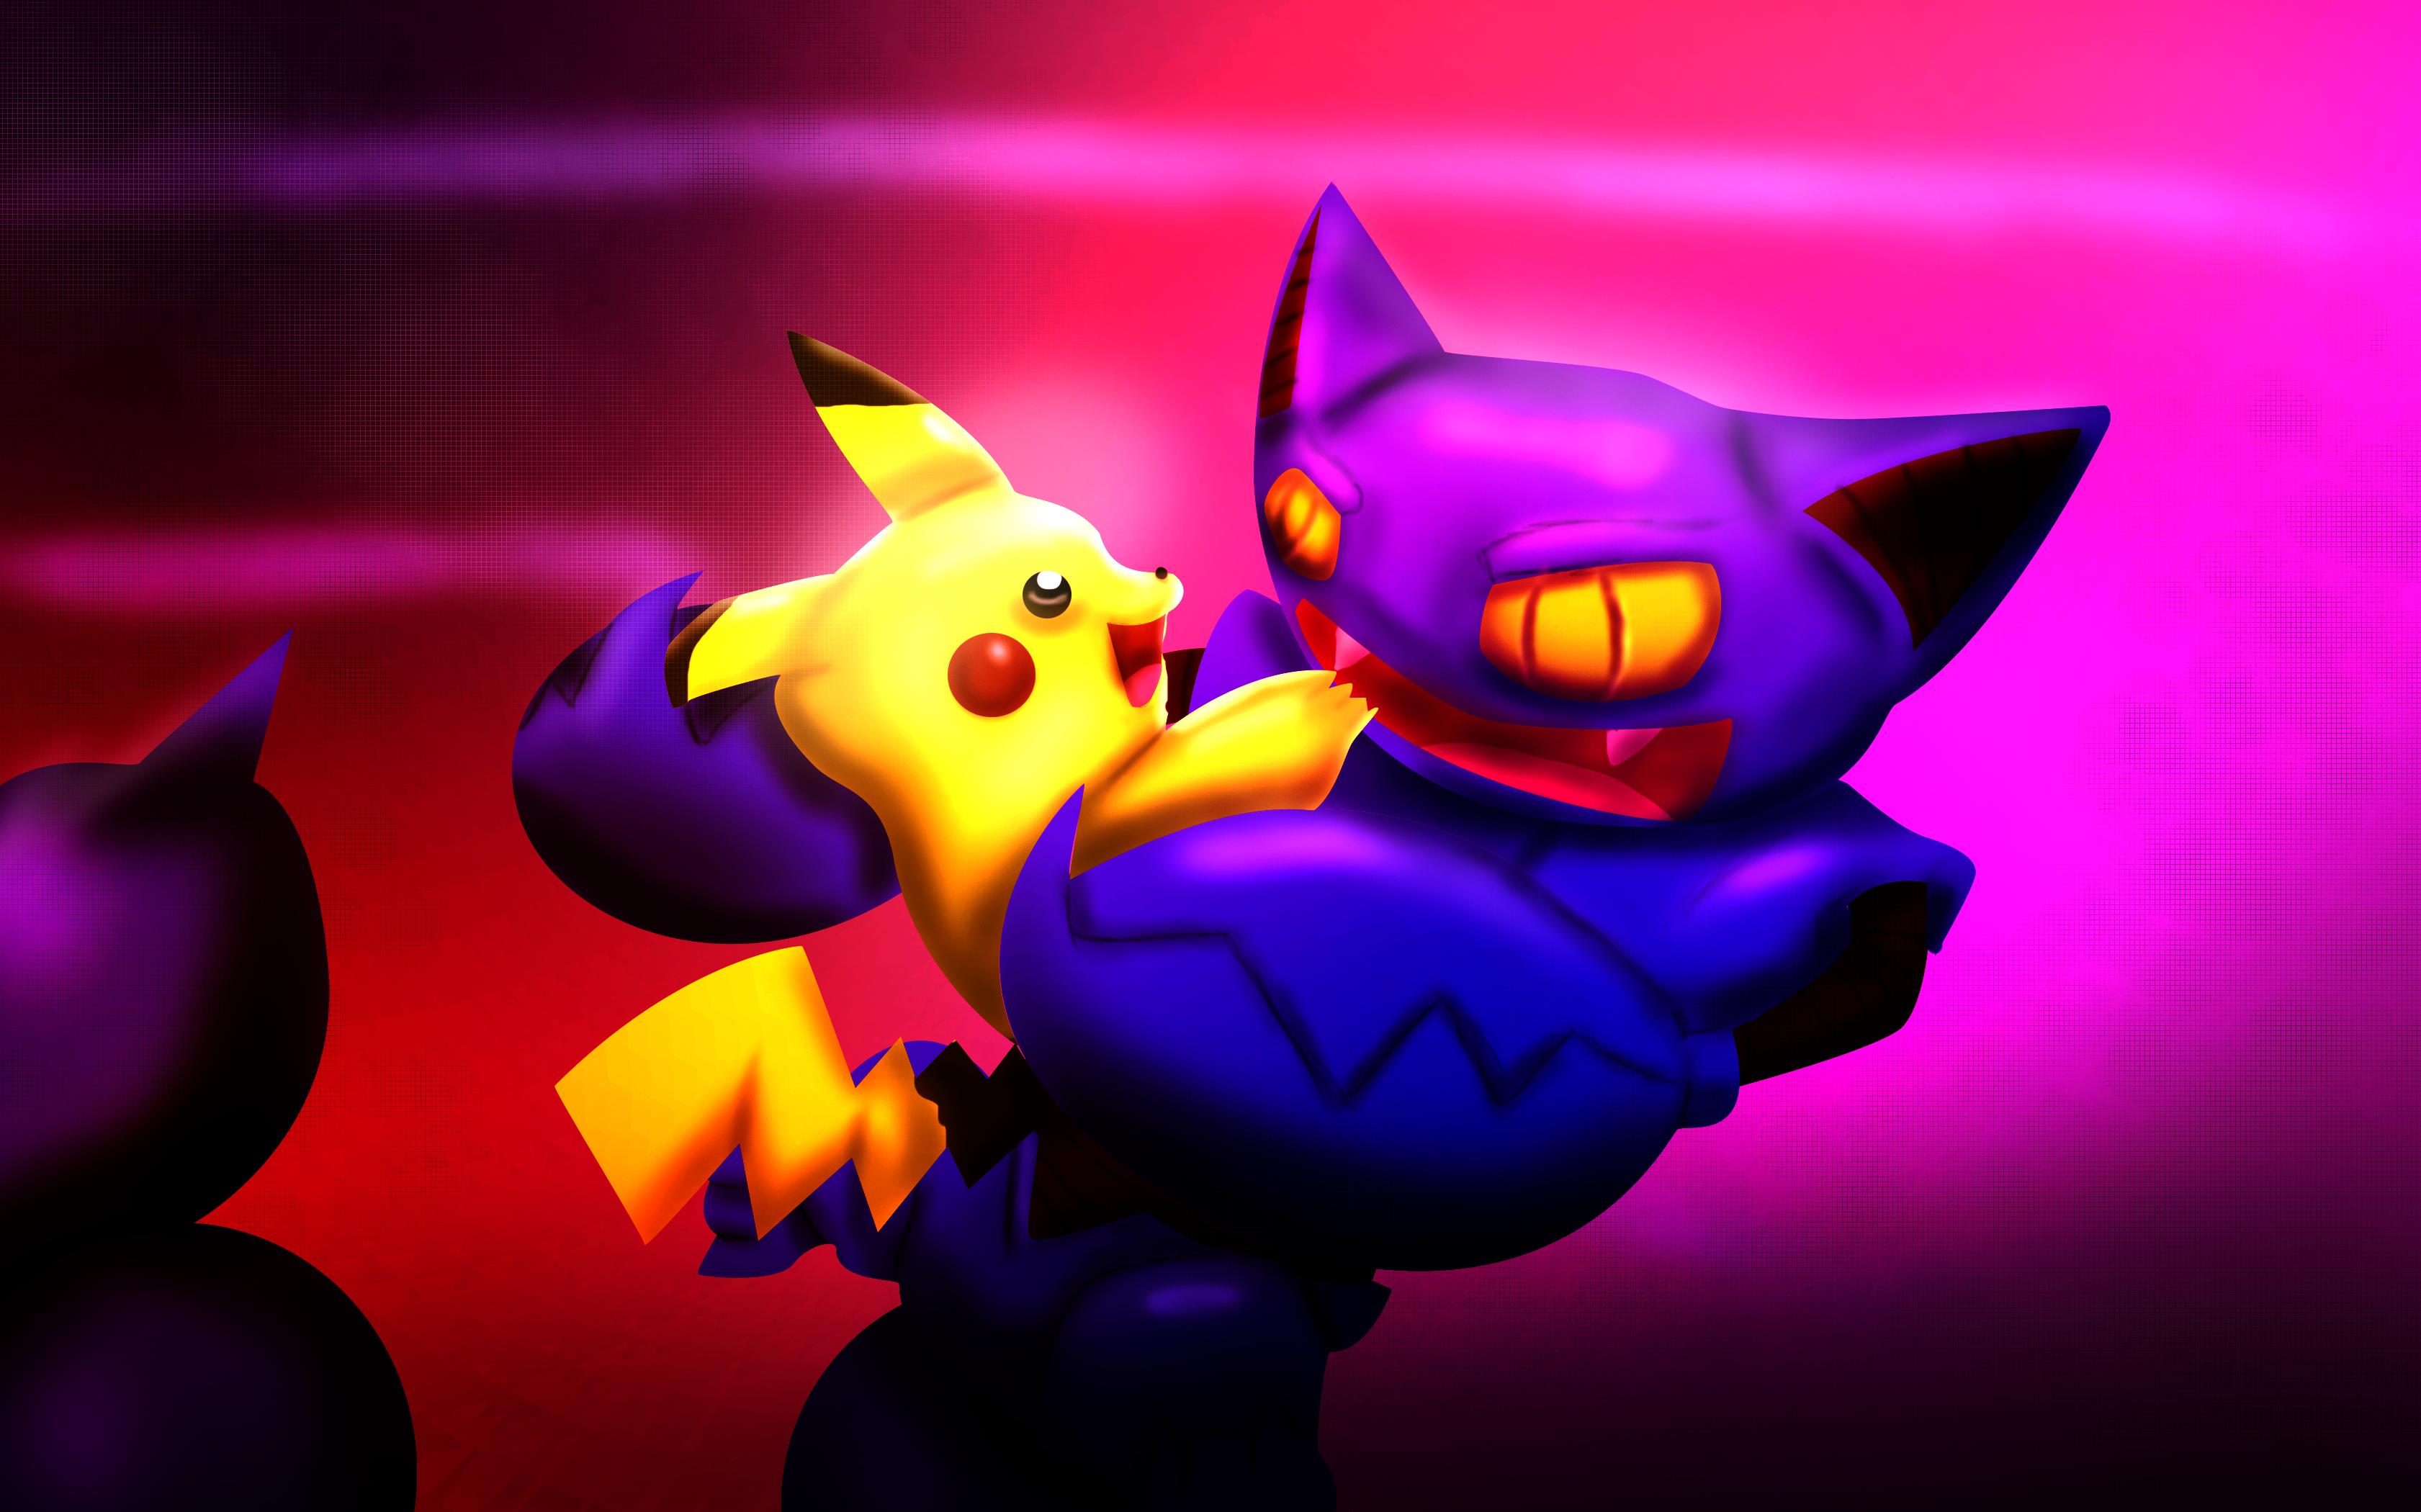 Gliscor and Pikachu